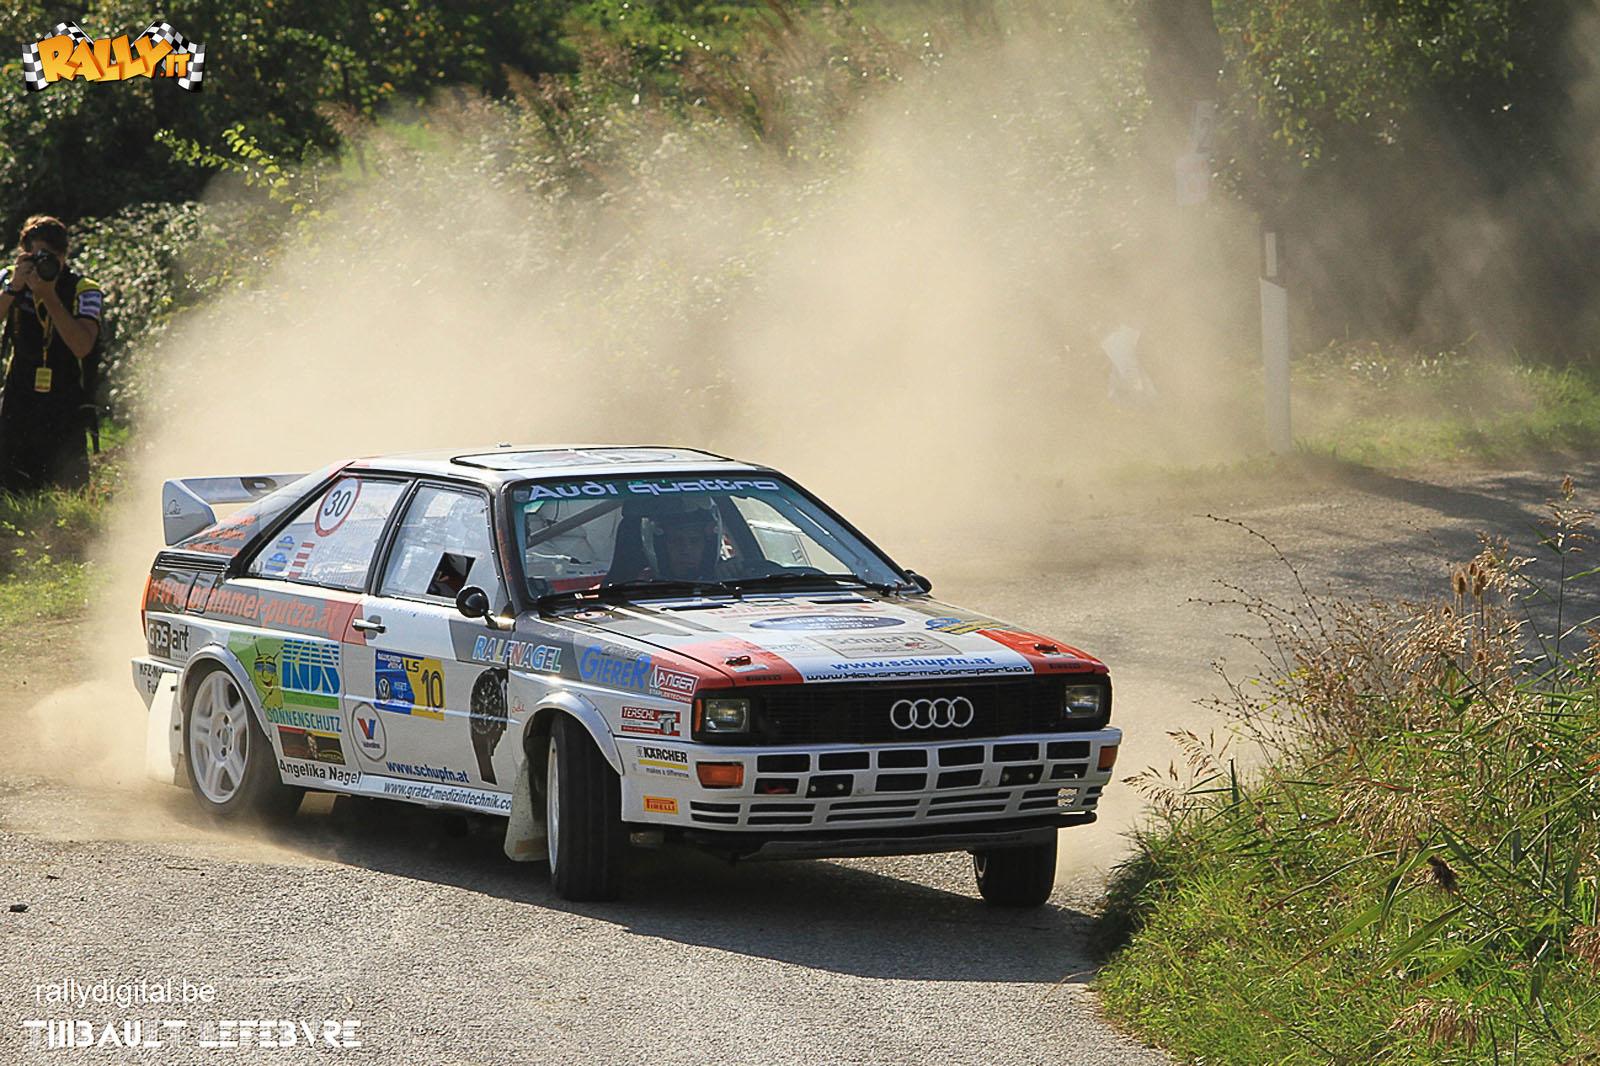 038-RallyLegend-2014.jpg